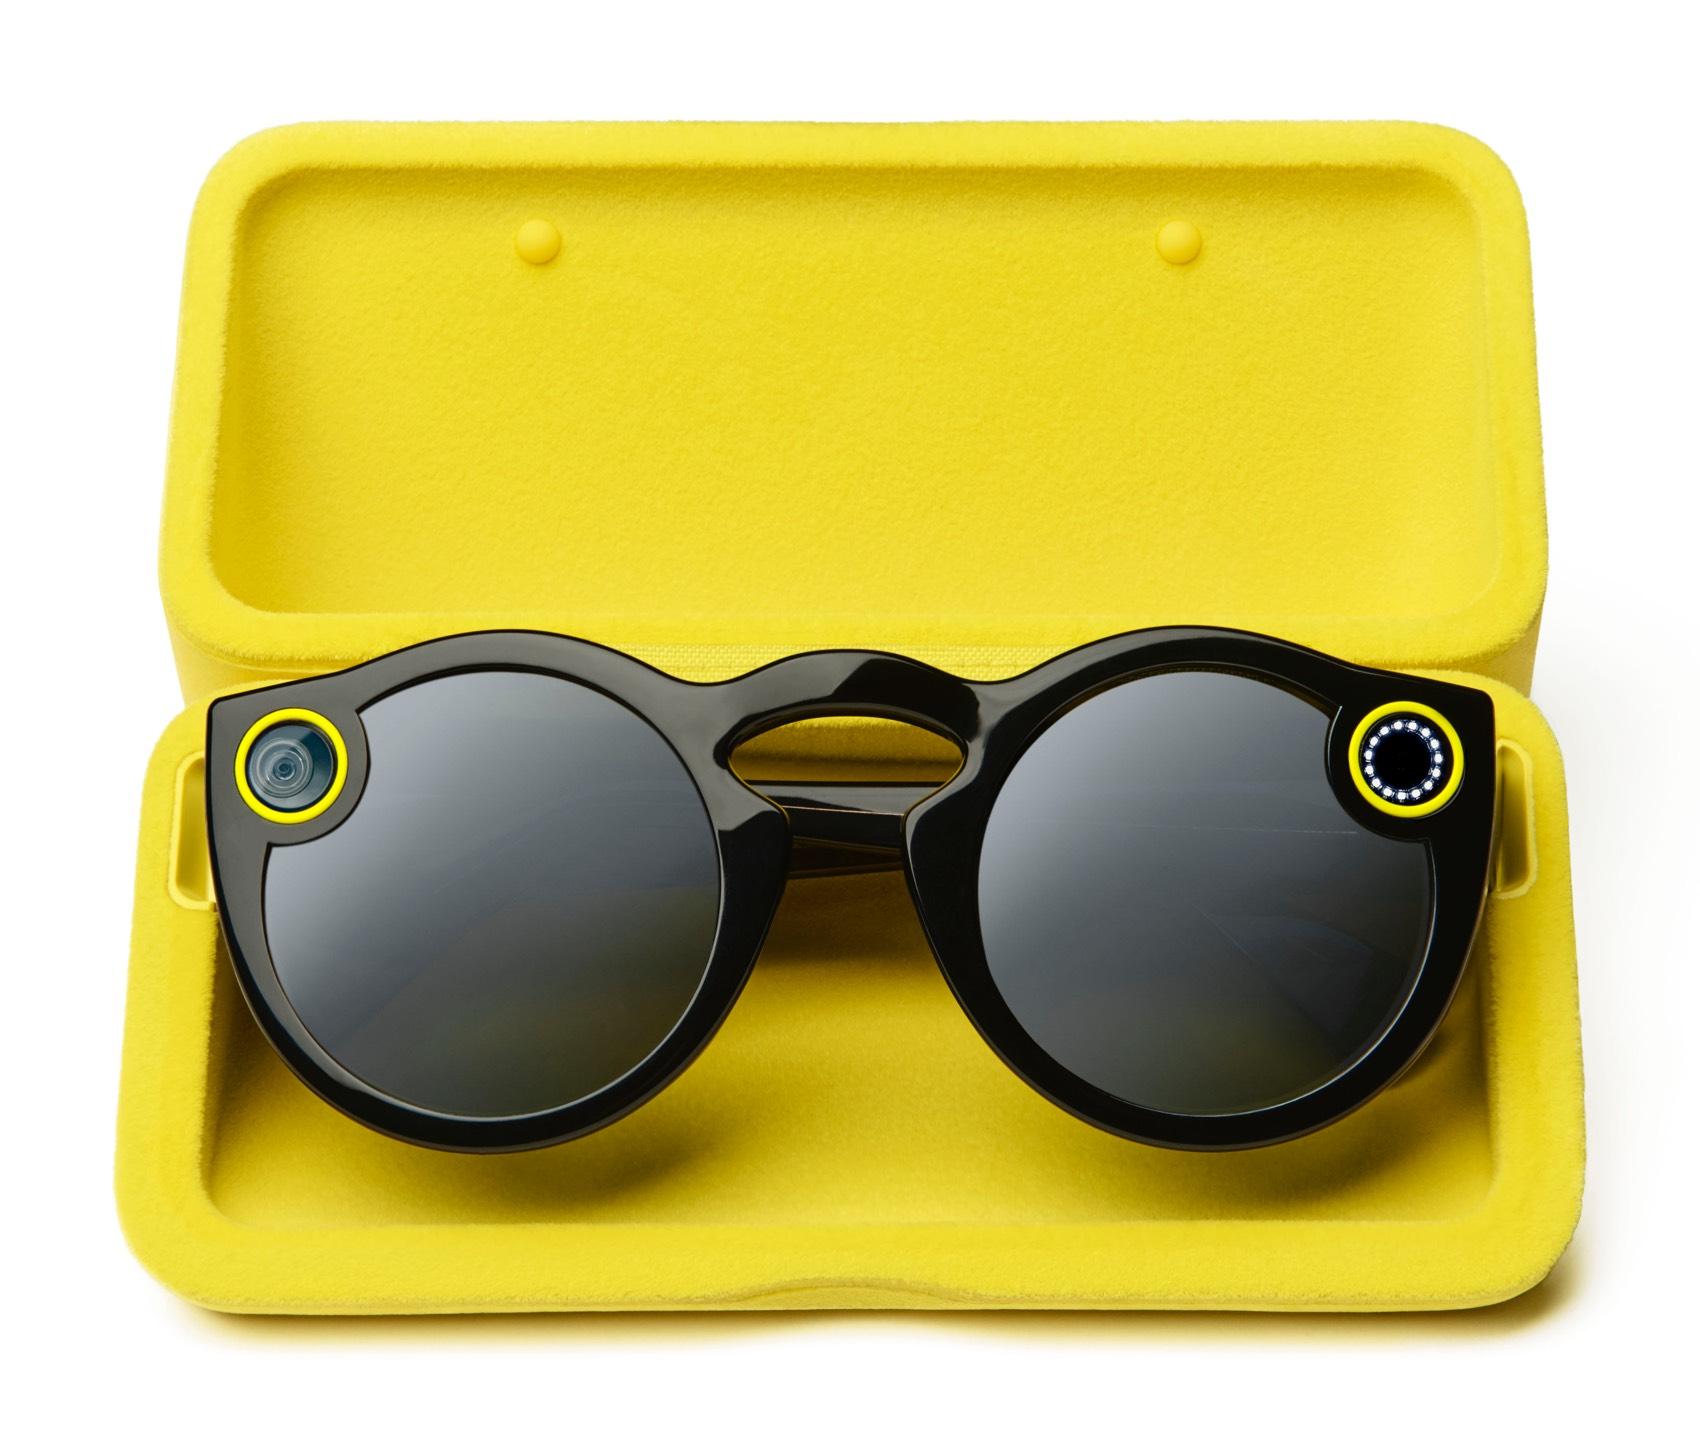 Imagen 3 de la campaña de marketing de la marca Spectacles by Sanp Inc